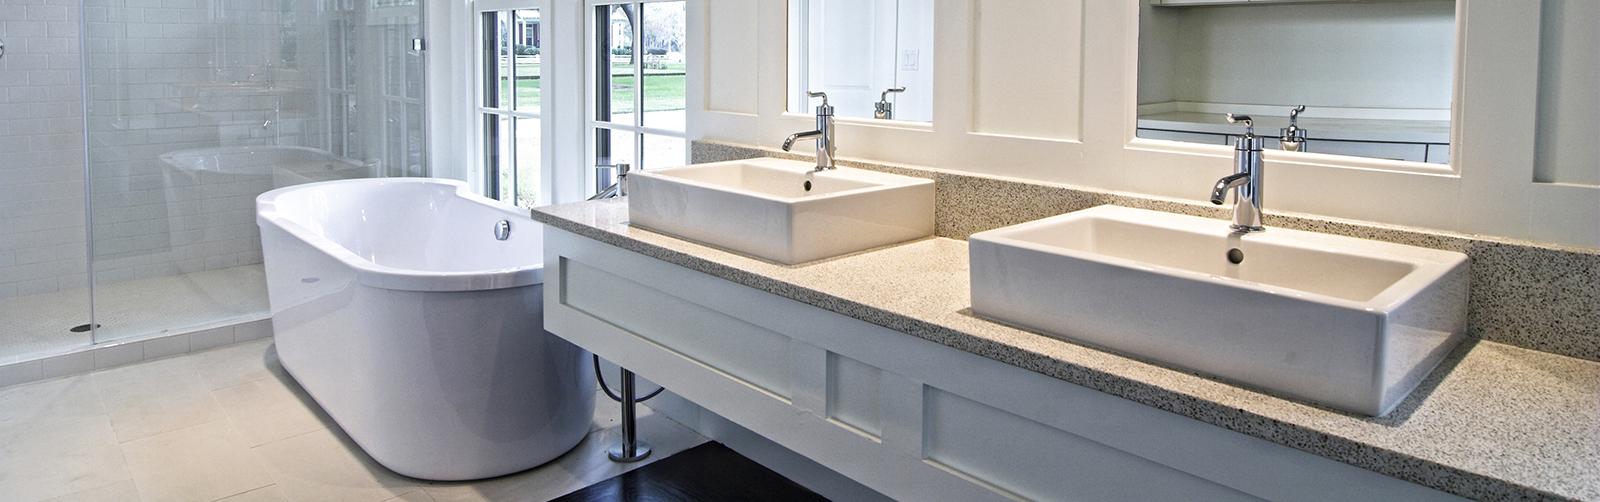 modern spacious white bathroom with dark wood floors